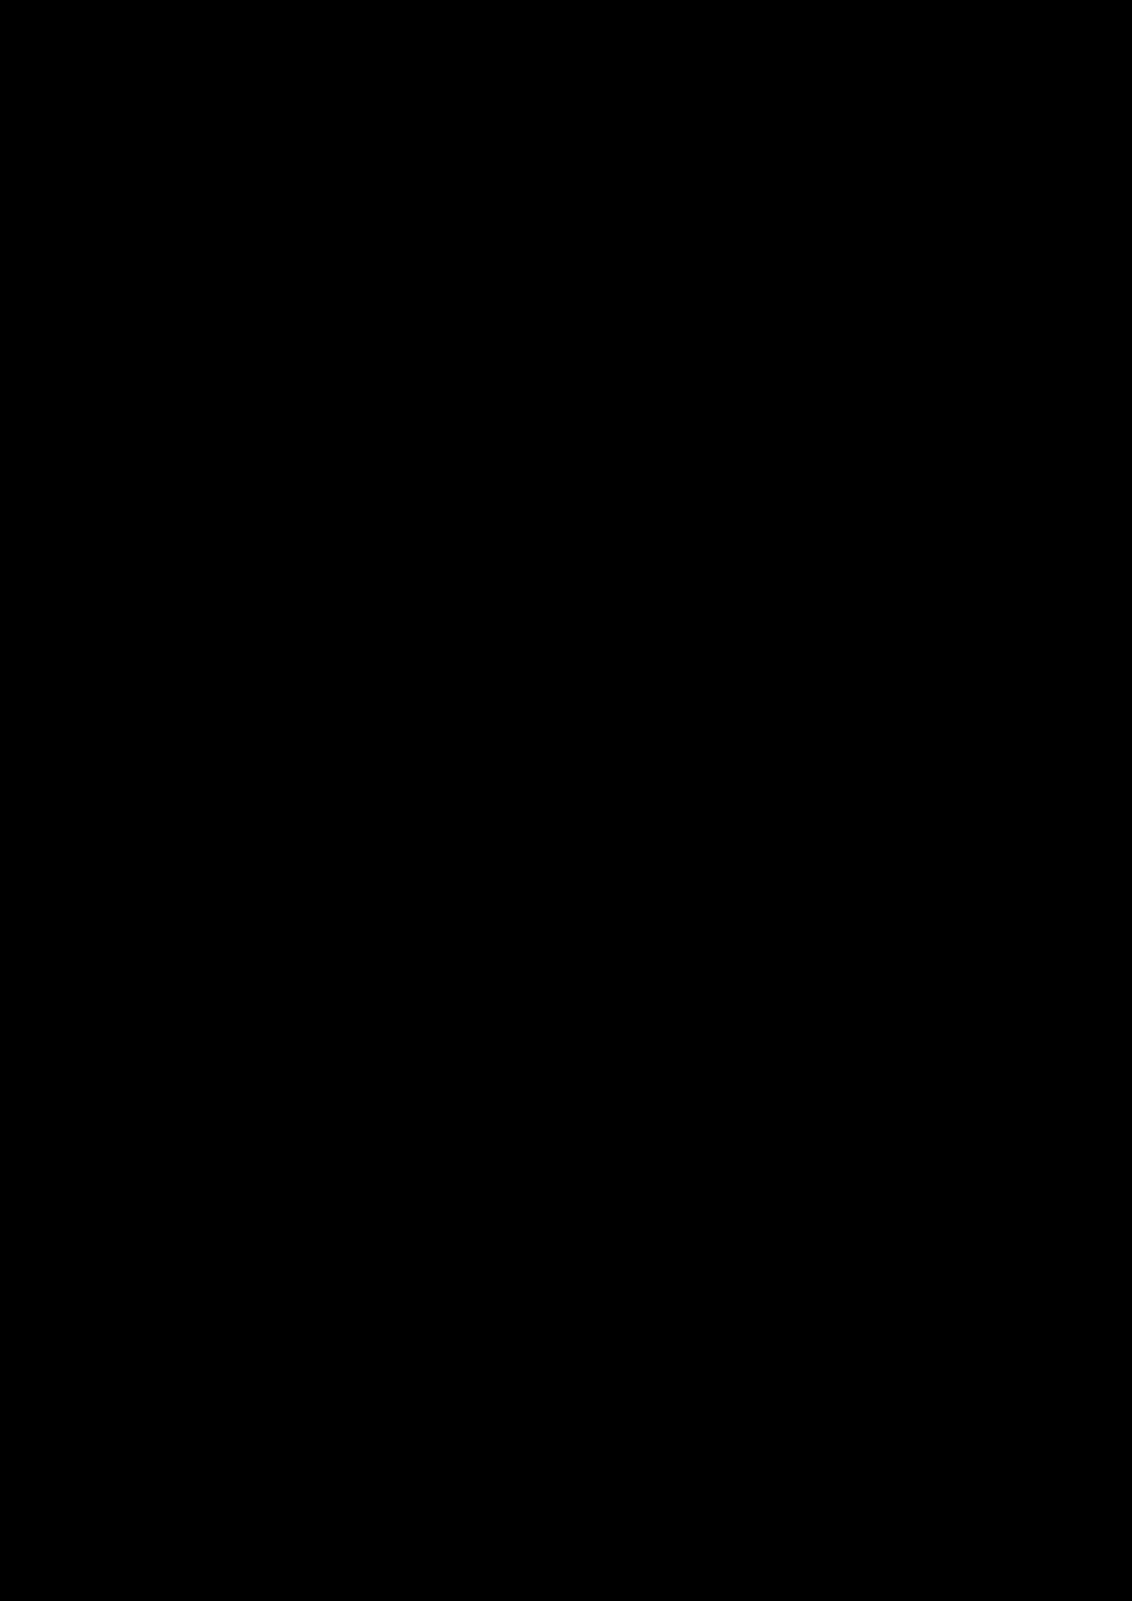 Belyiy sokol slide, Image 102